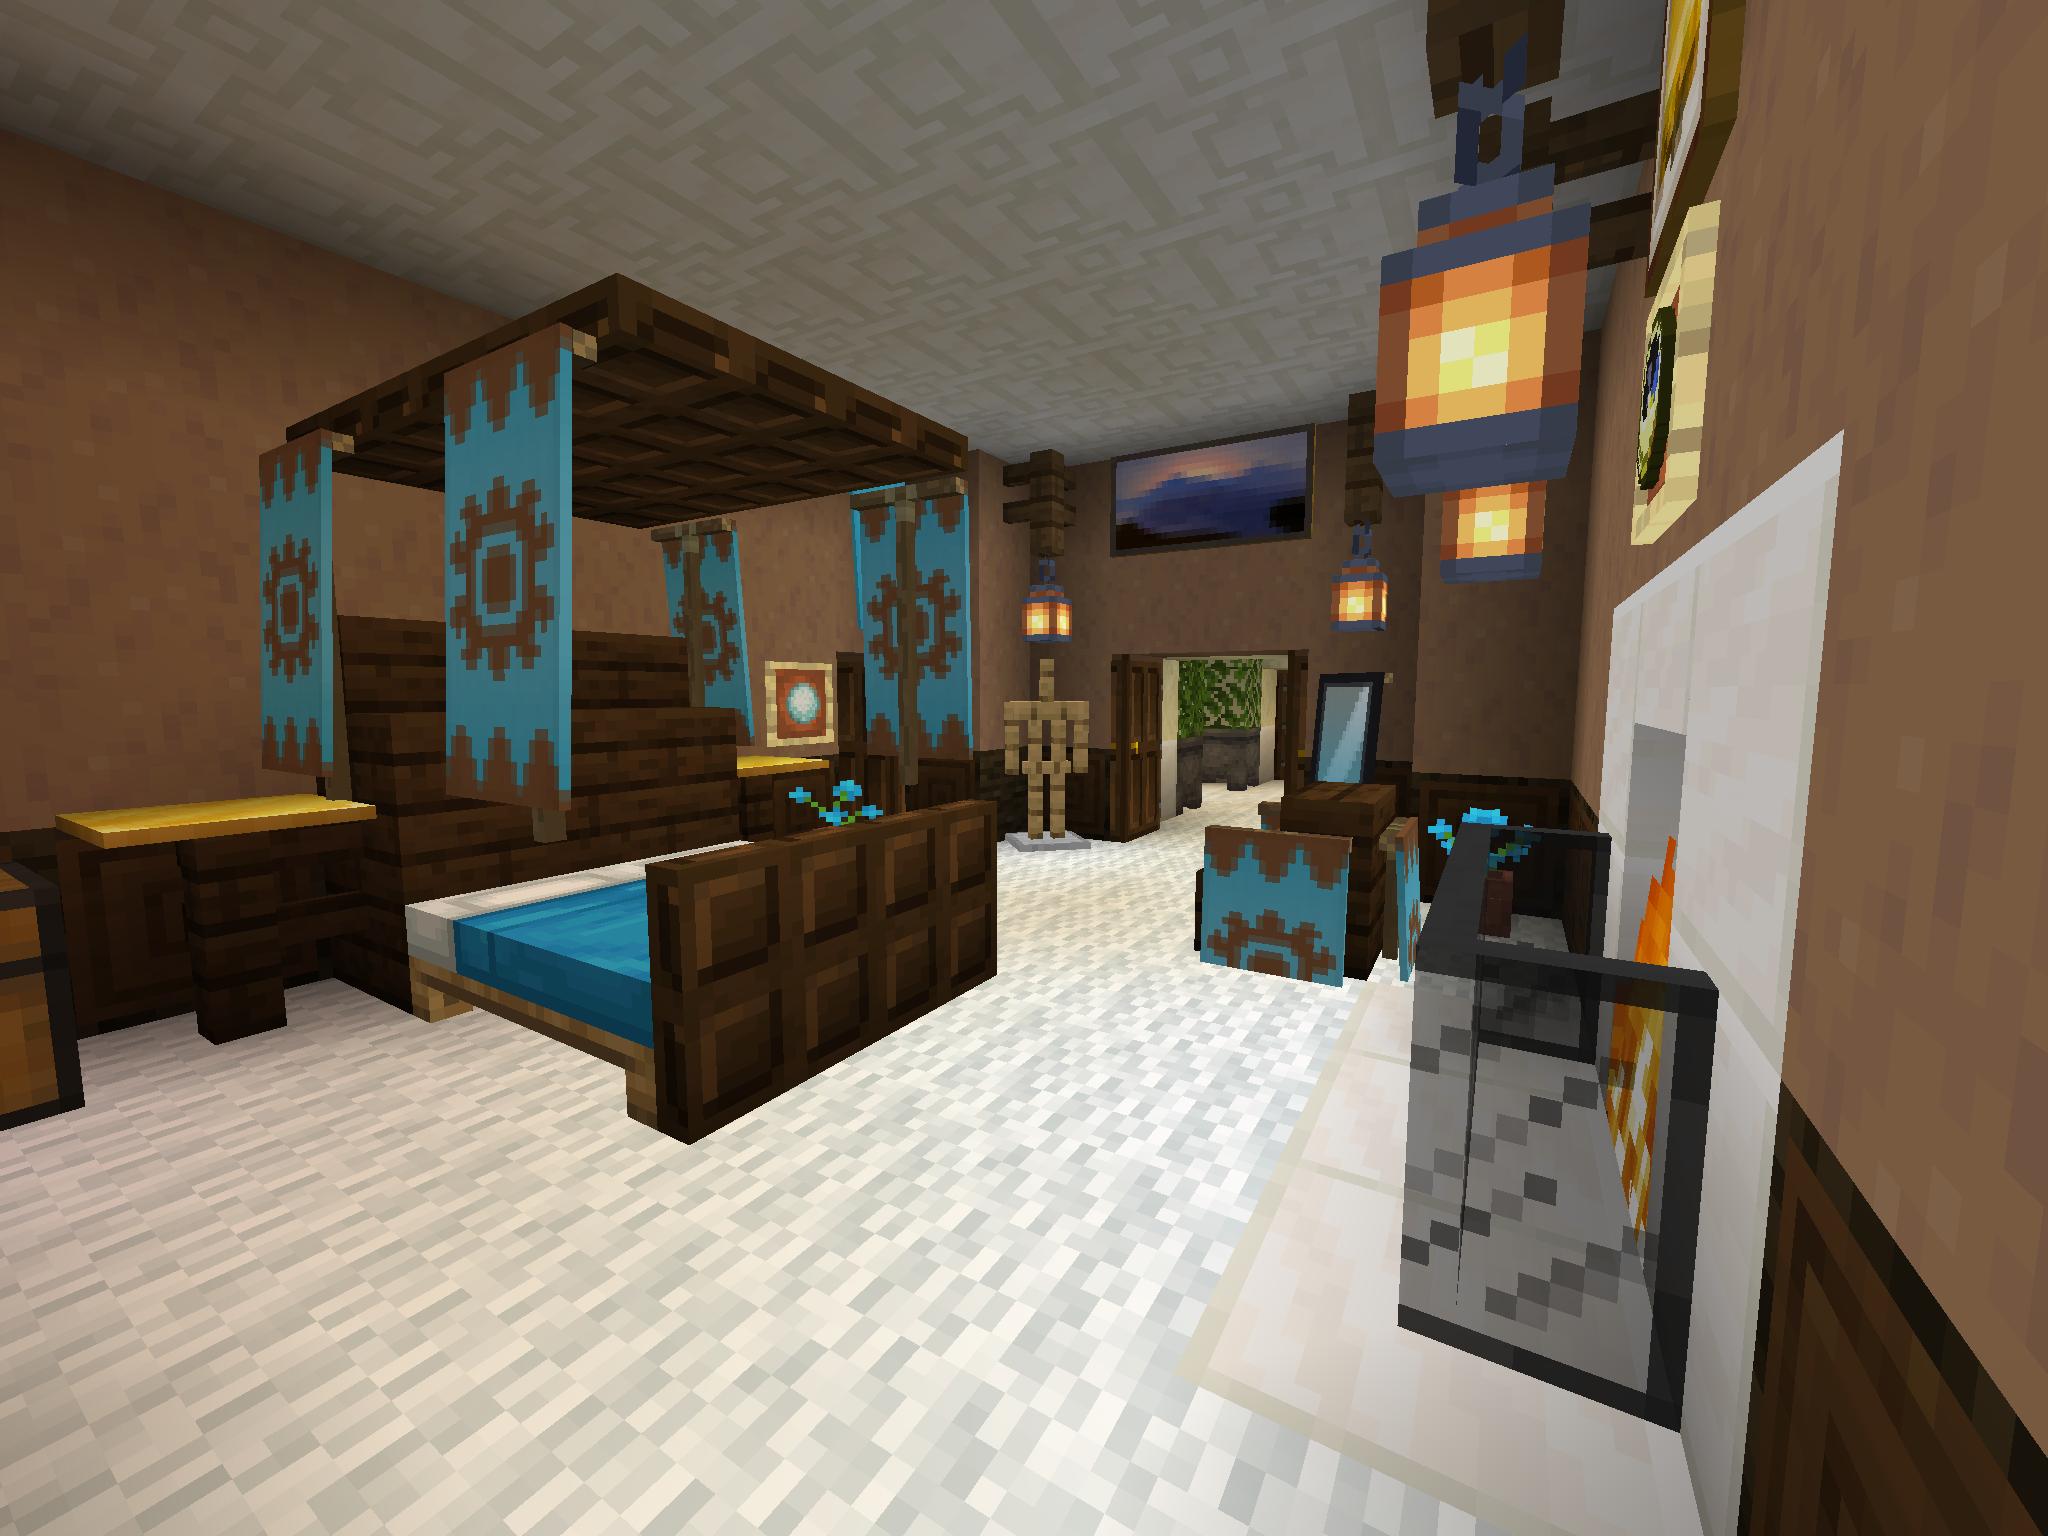 minecraftbuildingideas - pmm  Minecraft room, Minecraft bedroom